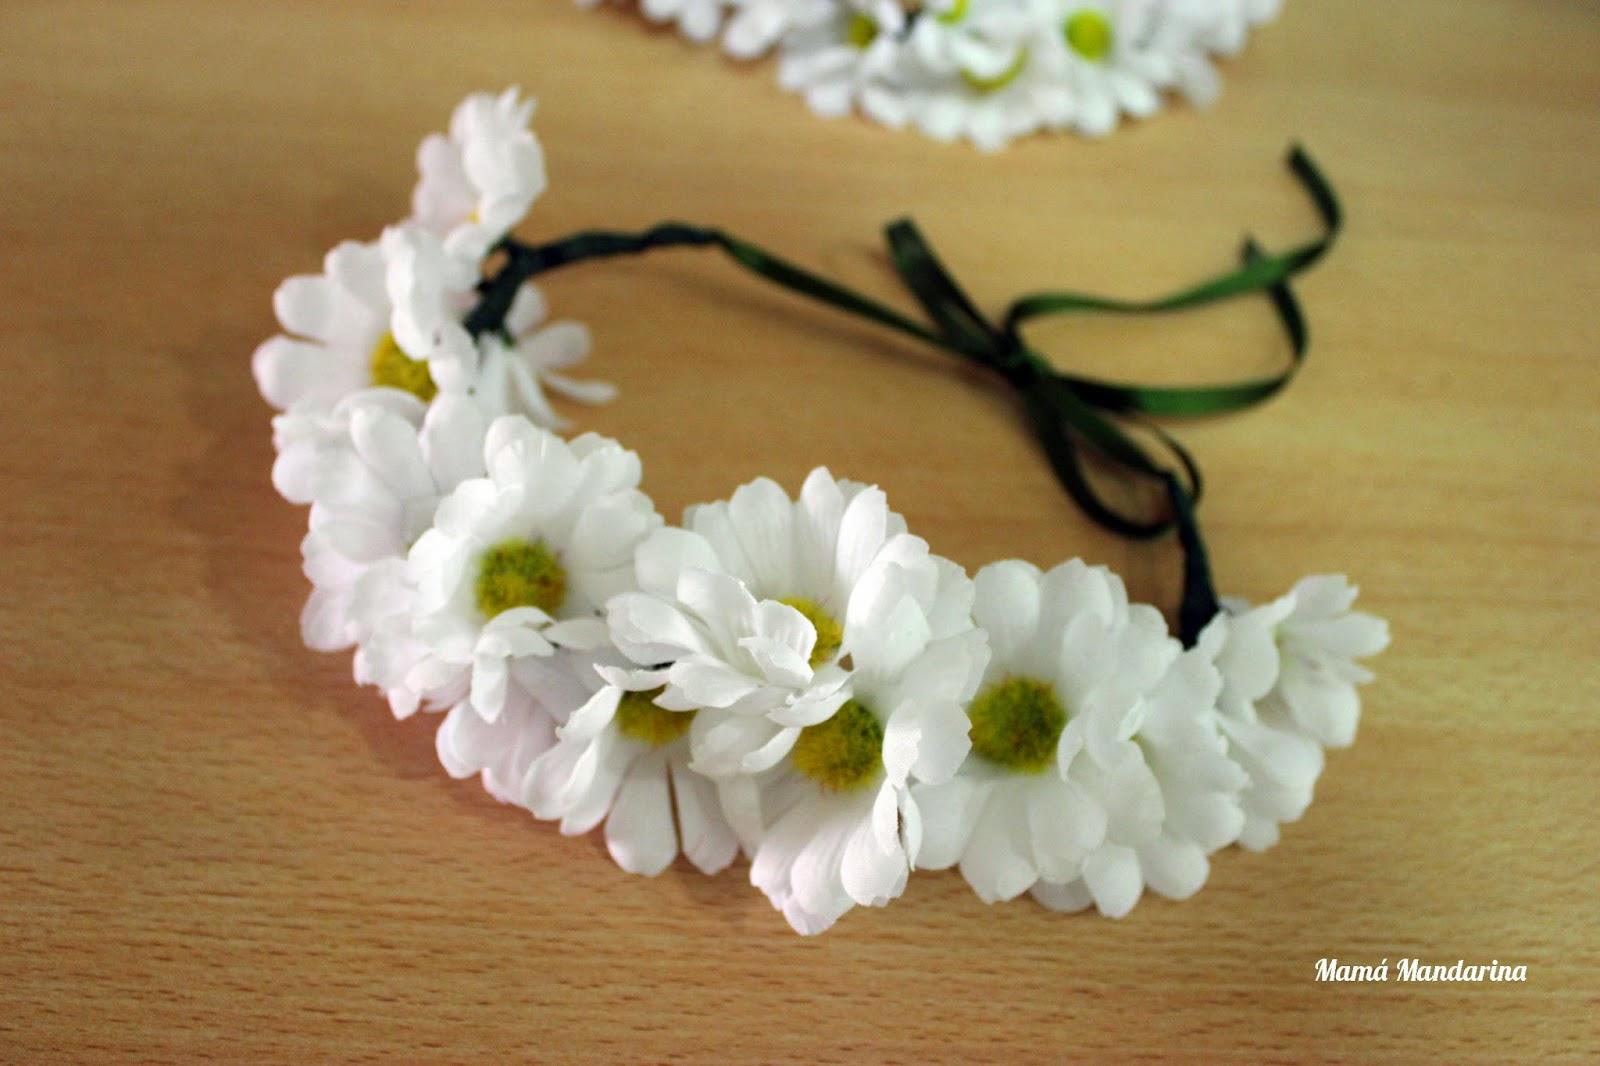 Mam mandarina coronas de flores hechas a mano for Coronas de navidad hechas a mano